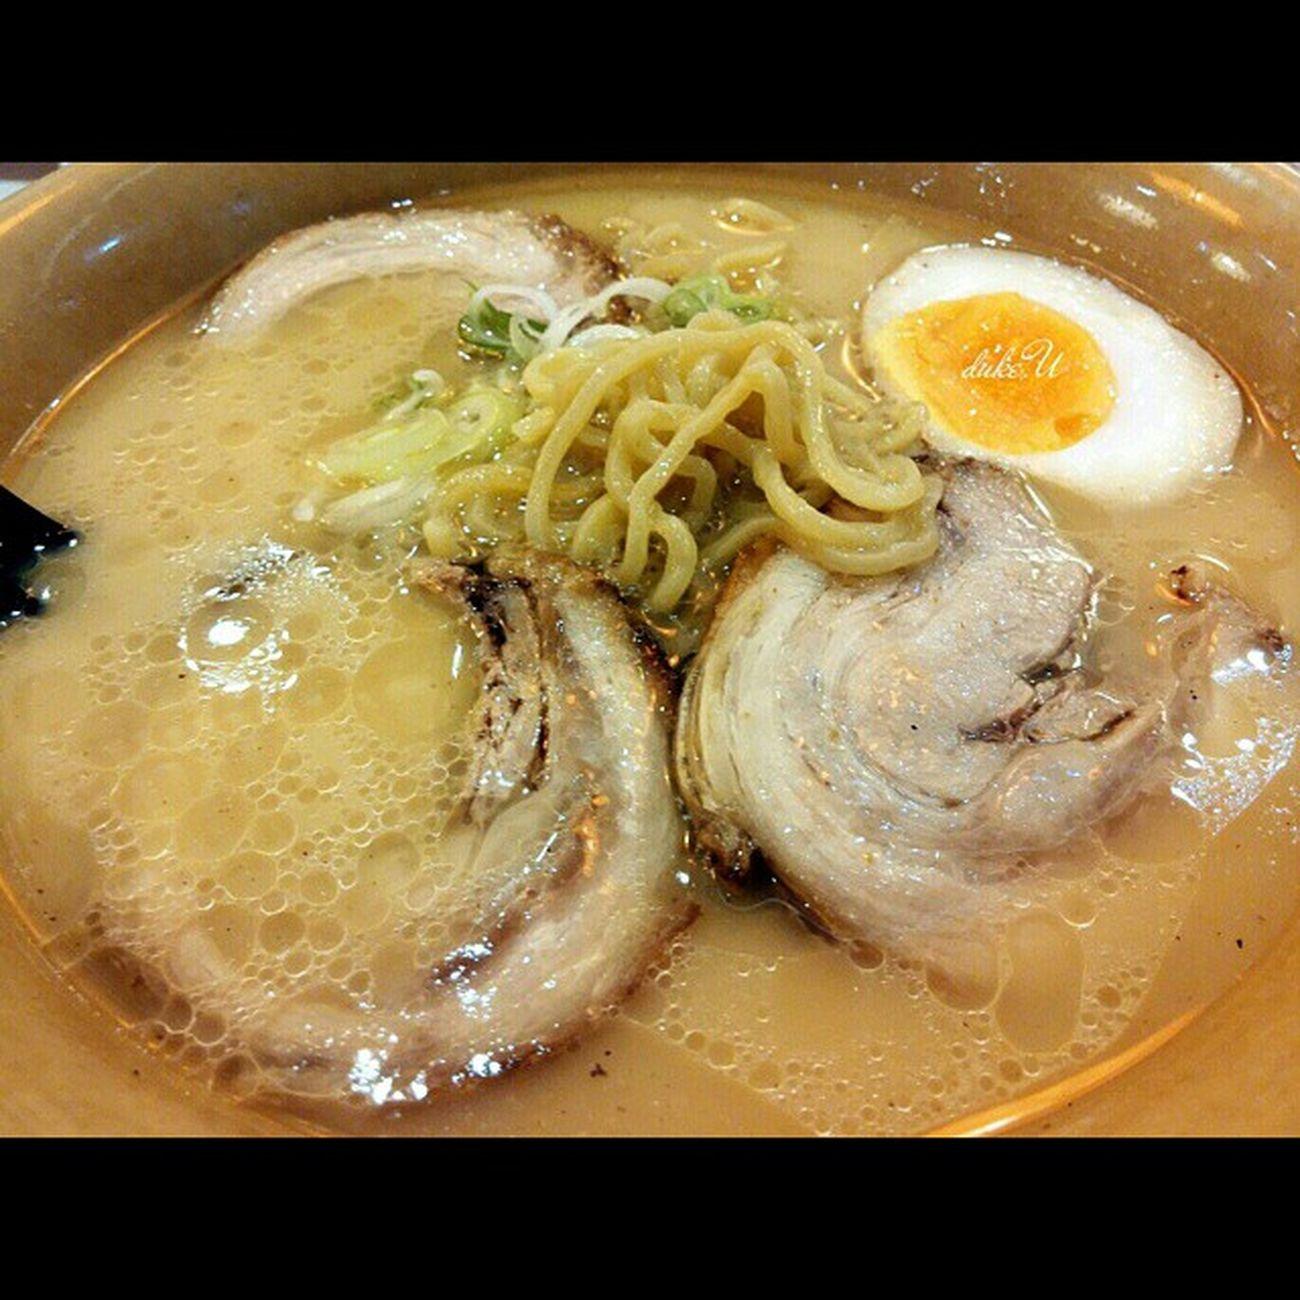 Tonkutsu Ramen Japanesefood Authenticfood traditionalfood yum gastronomy foodie foodgasm foodporn asianfood cuisine culinary noodles lgg2 foodtravel